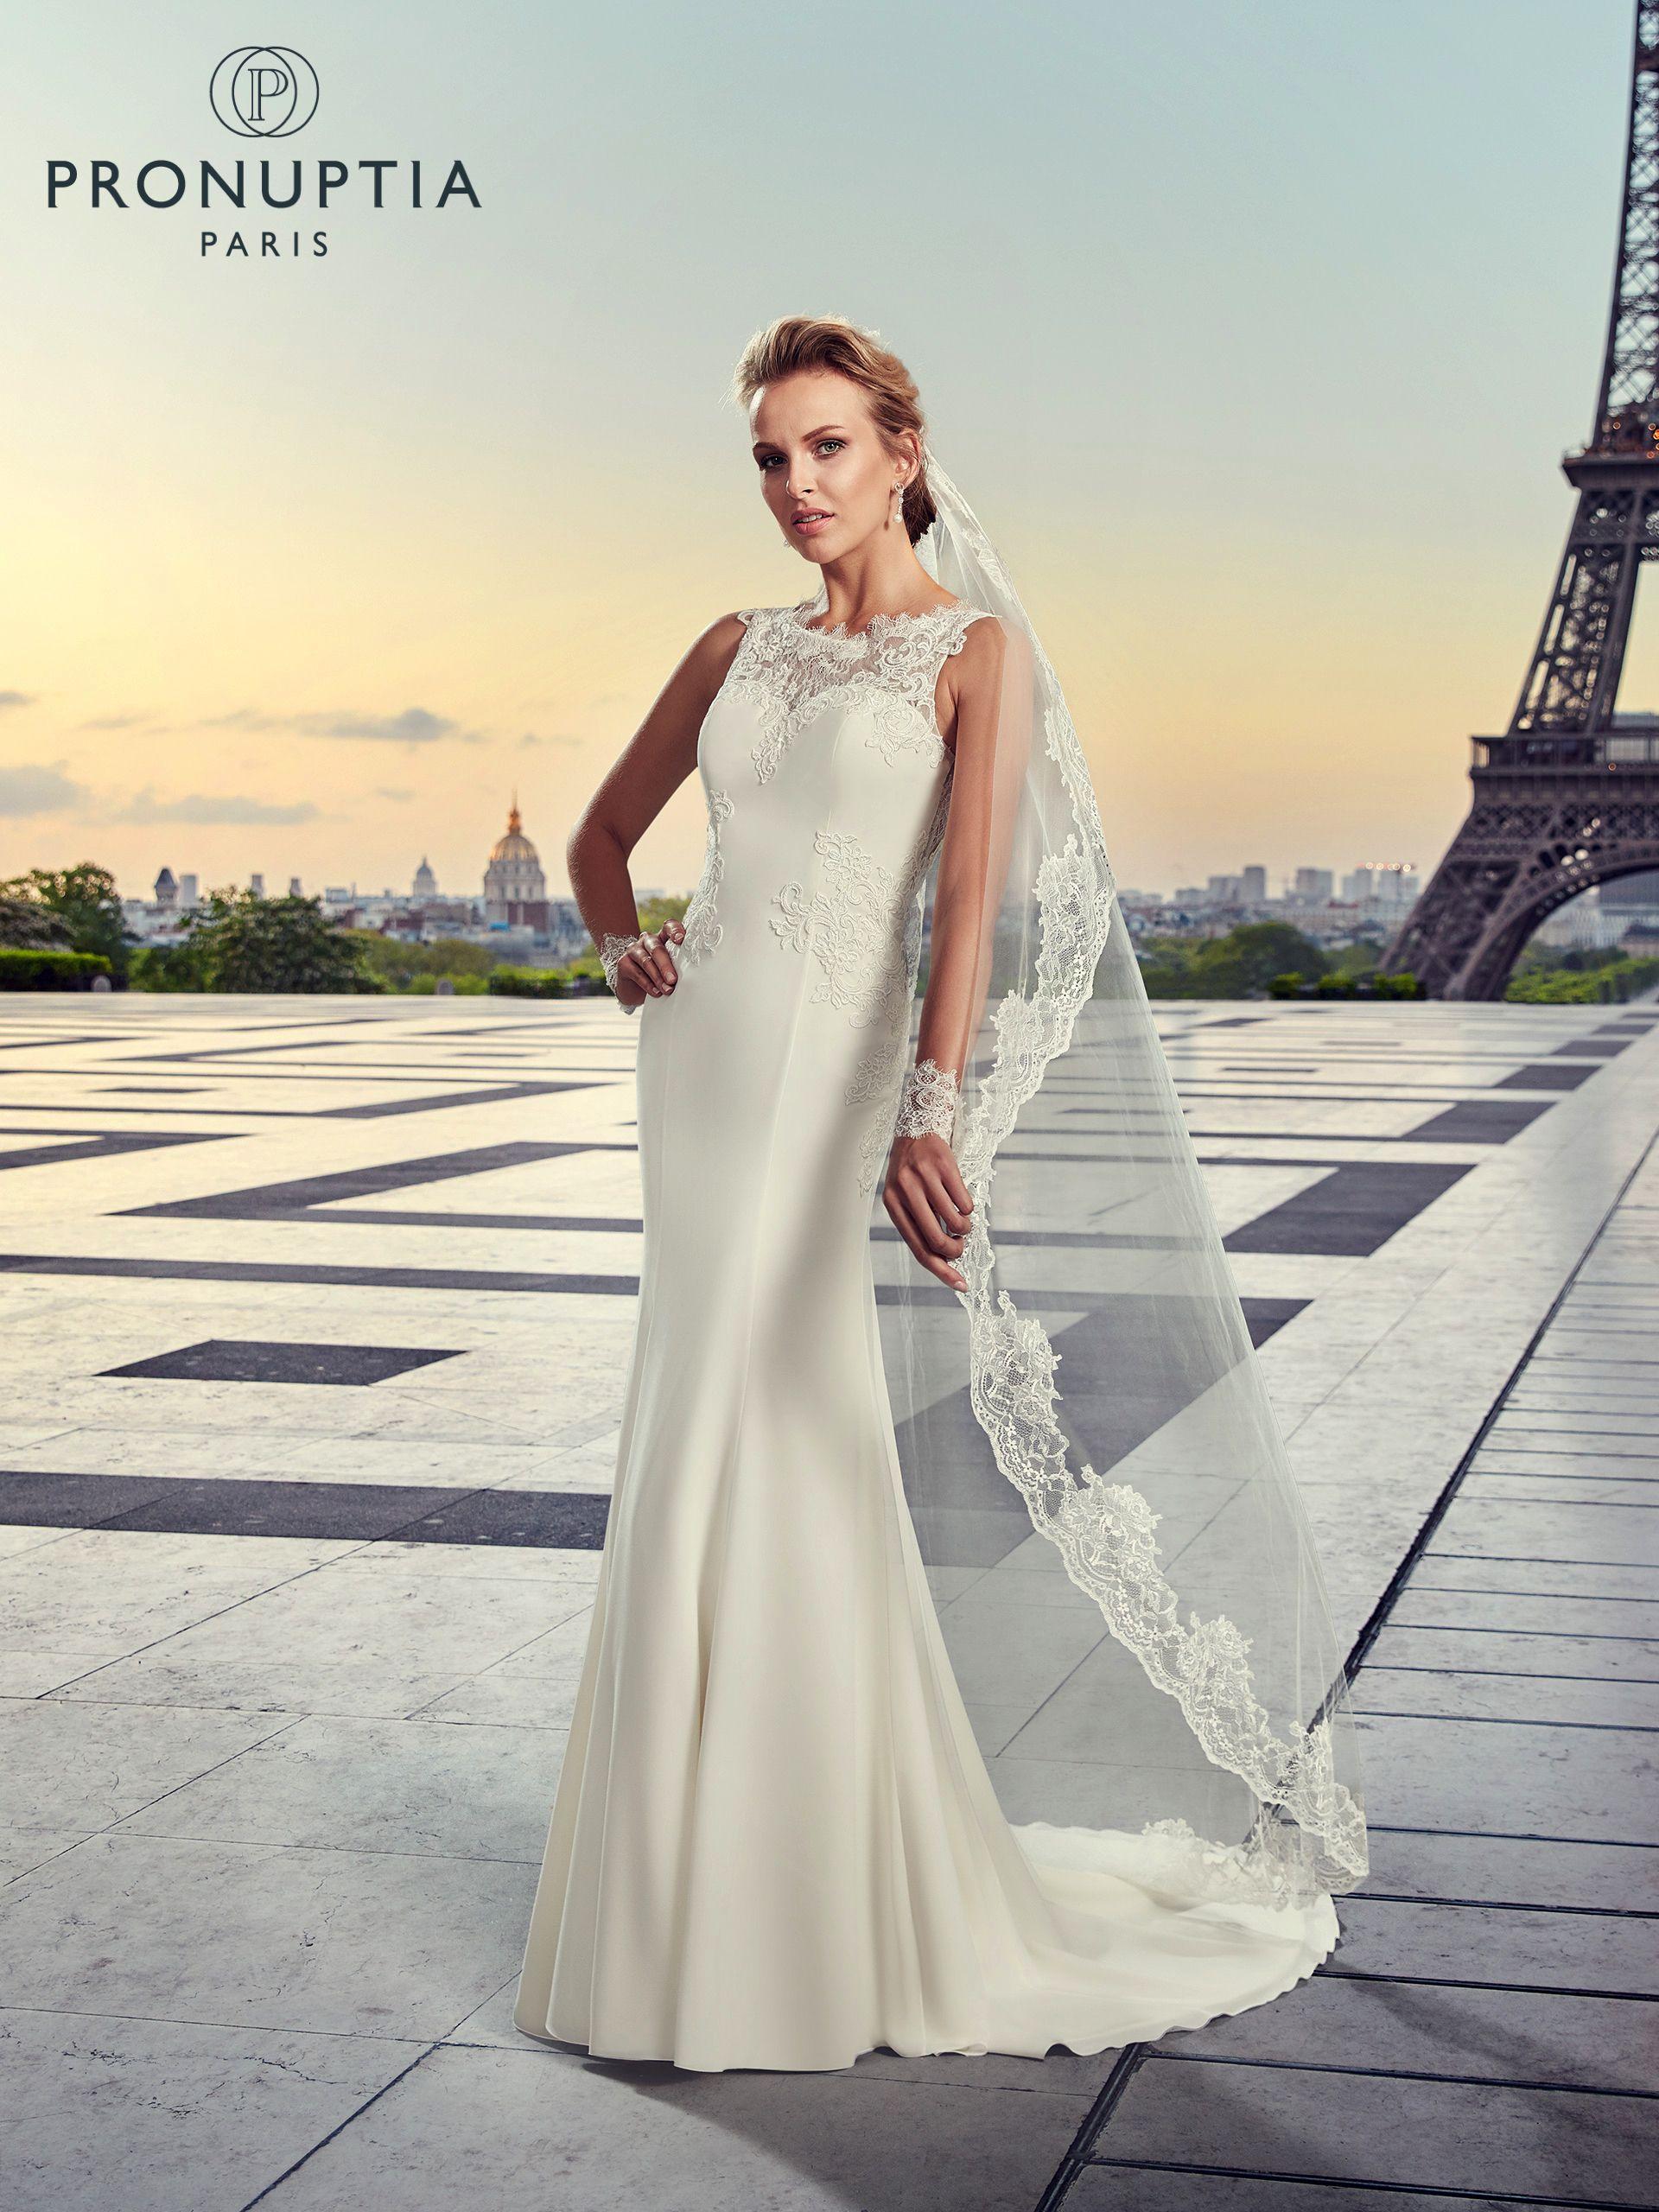 Robe de mariée Plaisance, robe de mariée